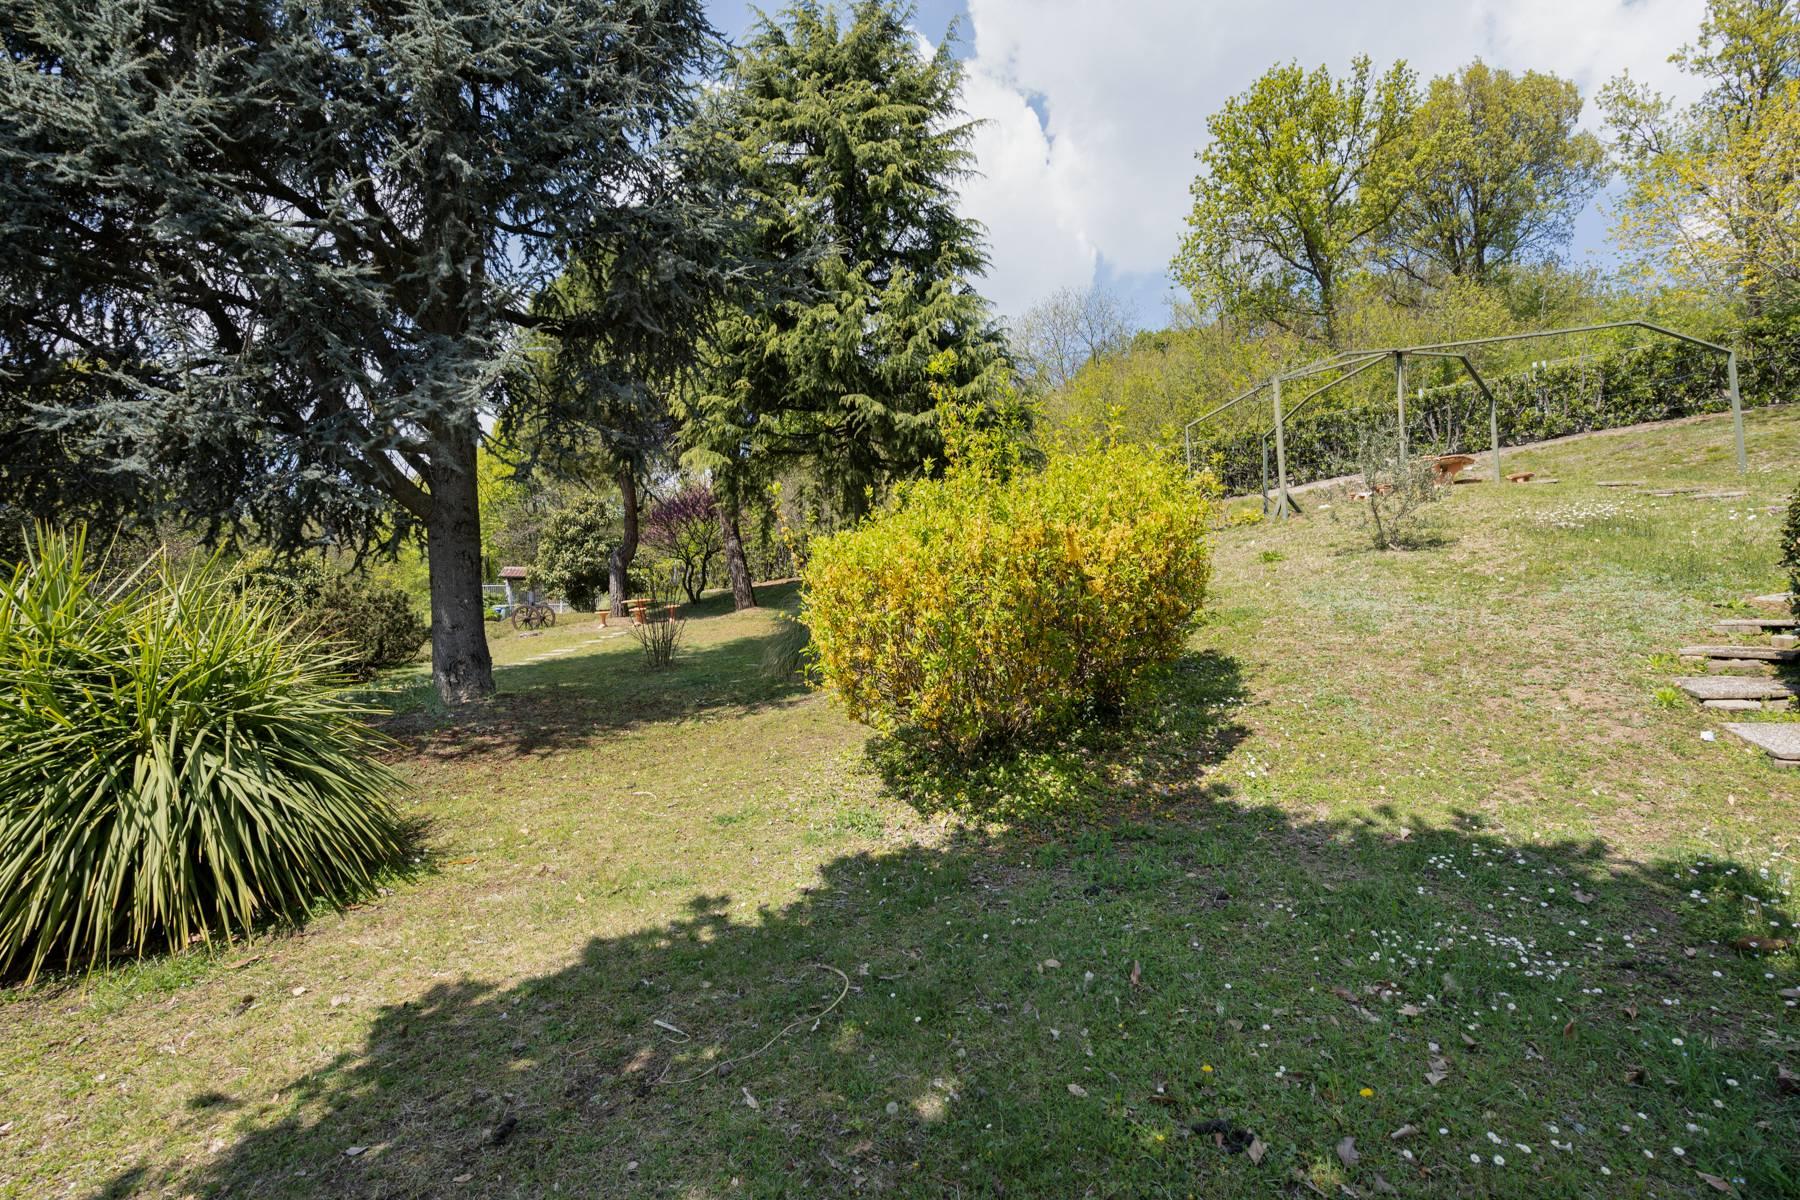 Villa in Vendita a Baldissero Torinese: 5 locali, 503 mq - Foto 3